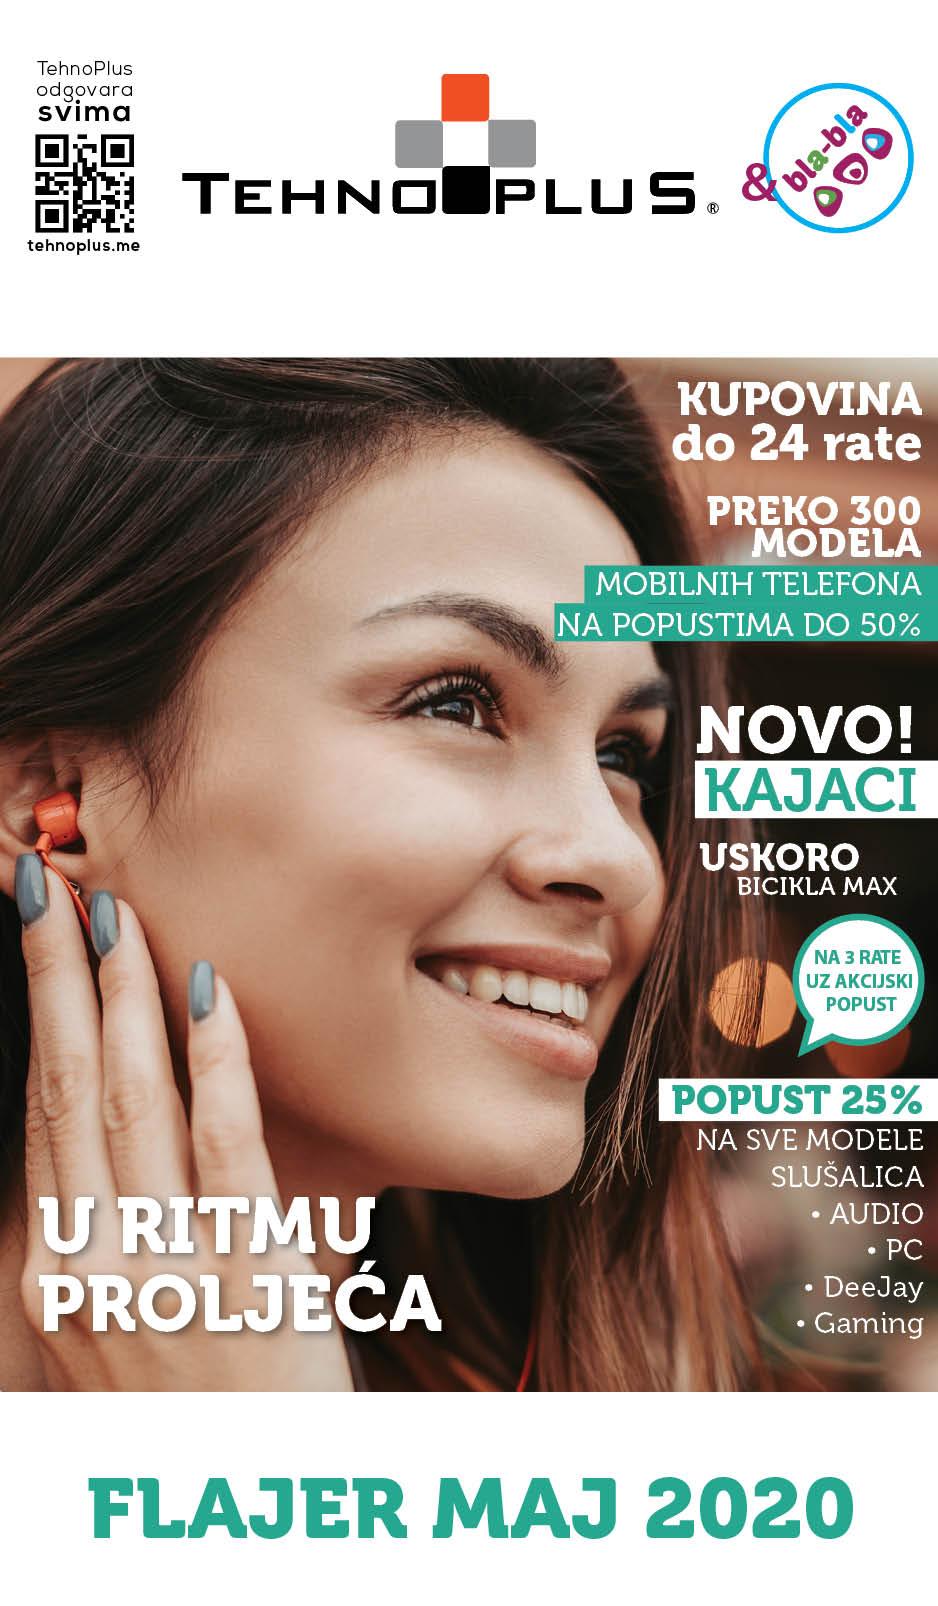 https://katalog.tehnoplus.me/APRIL2020/?utm_source=katalog&utm_medium=katalog&utm_campaign=Oktobar%202018&utm_content=katalog